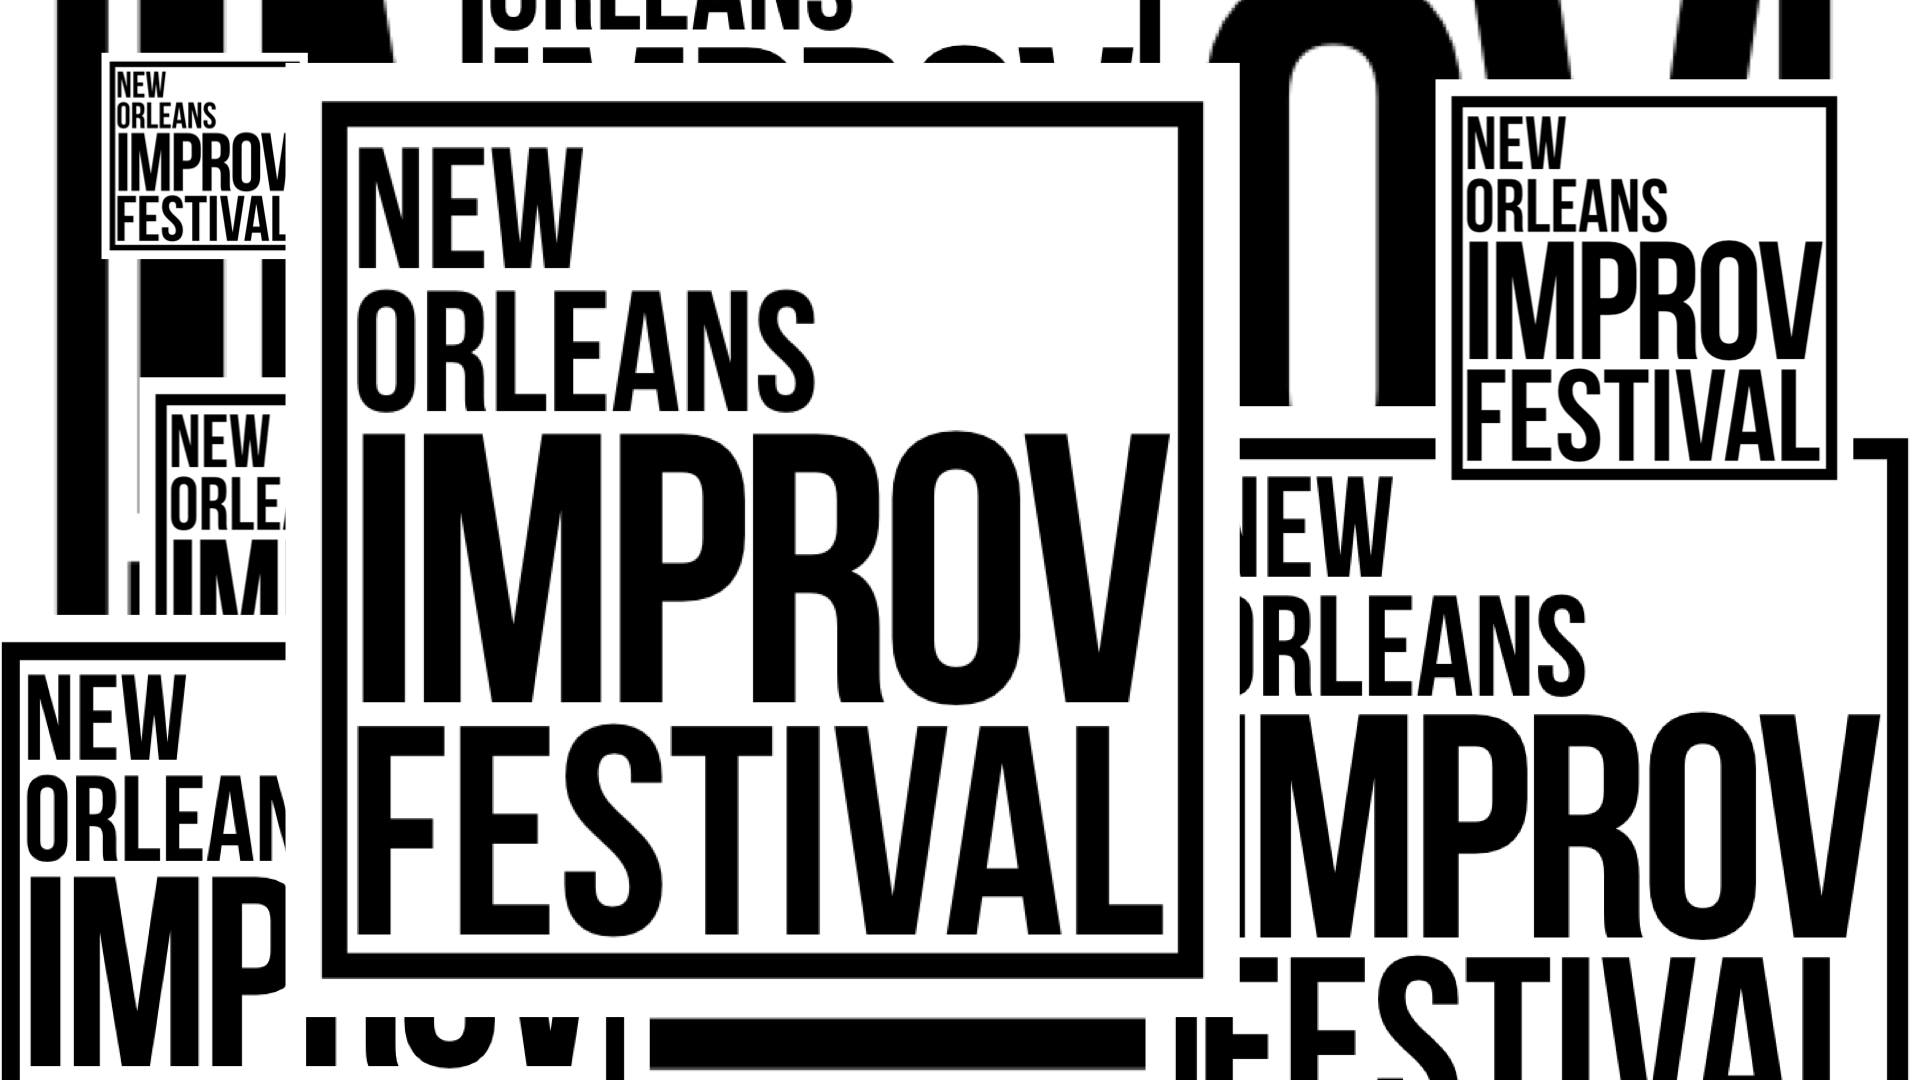 improv festival.jpg